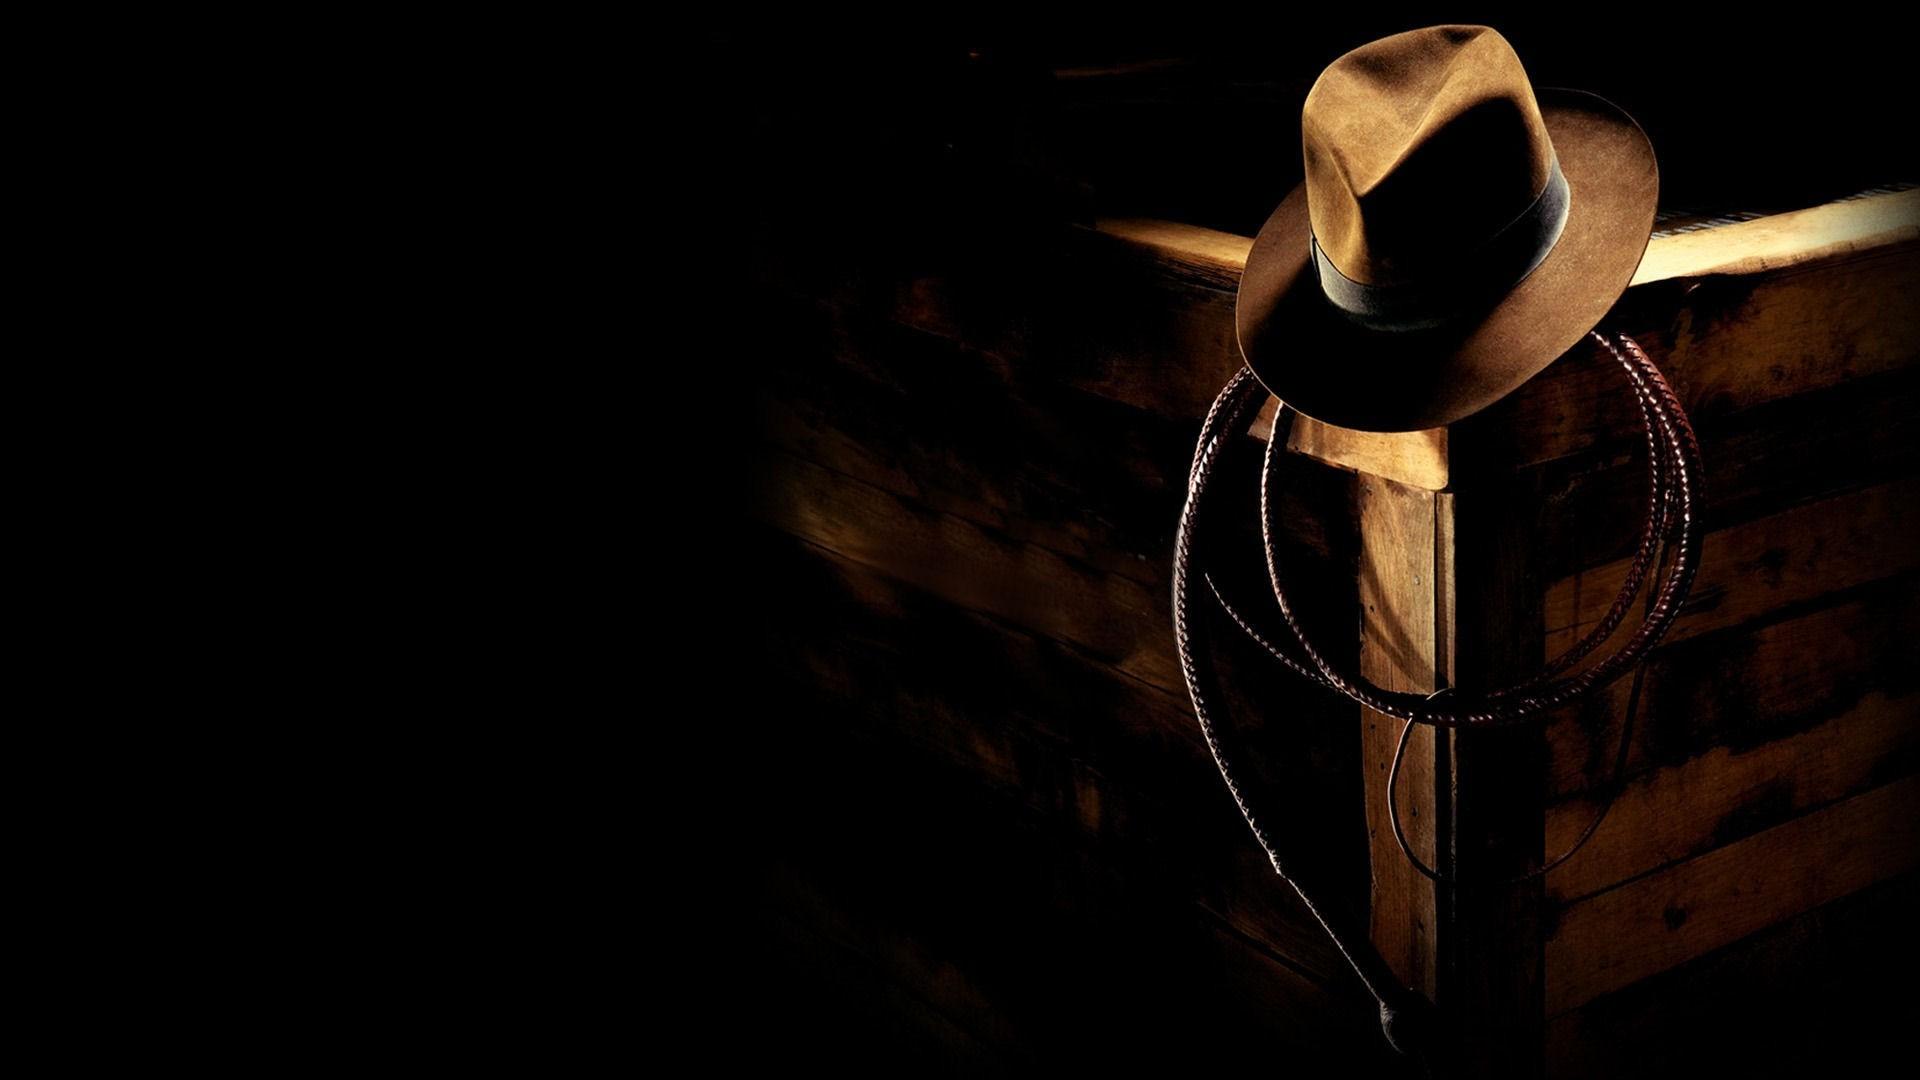 Indiana Jones And The Fate Of Atlantis Full HD Wallpaper